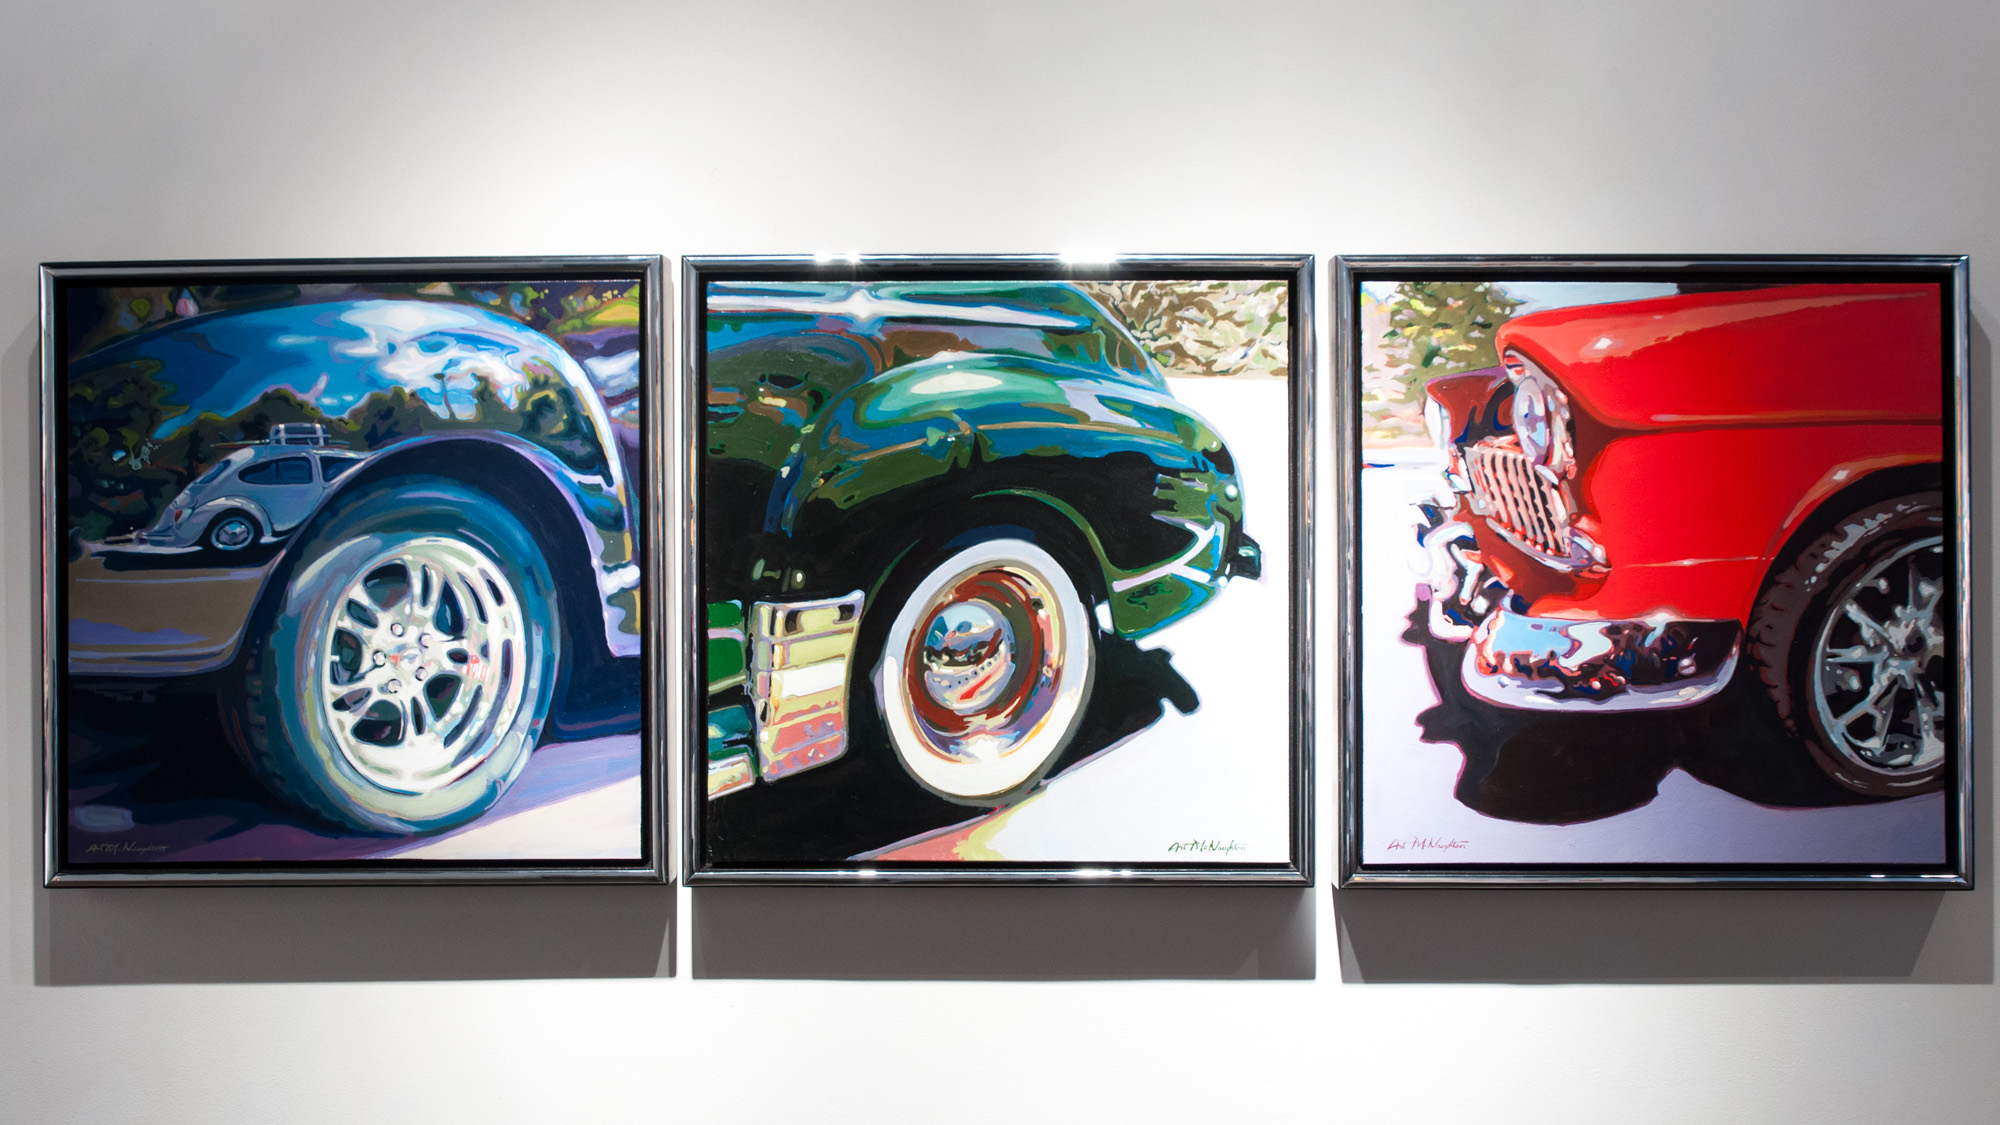 L Art McNaughton Car Show #4 oil on canvas 24 x 24 inches AMC 006G C Art McNaughton Car Show #2 oil on canvas 24 x 24 inches AMC 007G R Art McNaughton Car Show #3 oil on canvas 24 x 24 inches AMC 005G